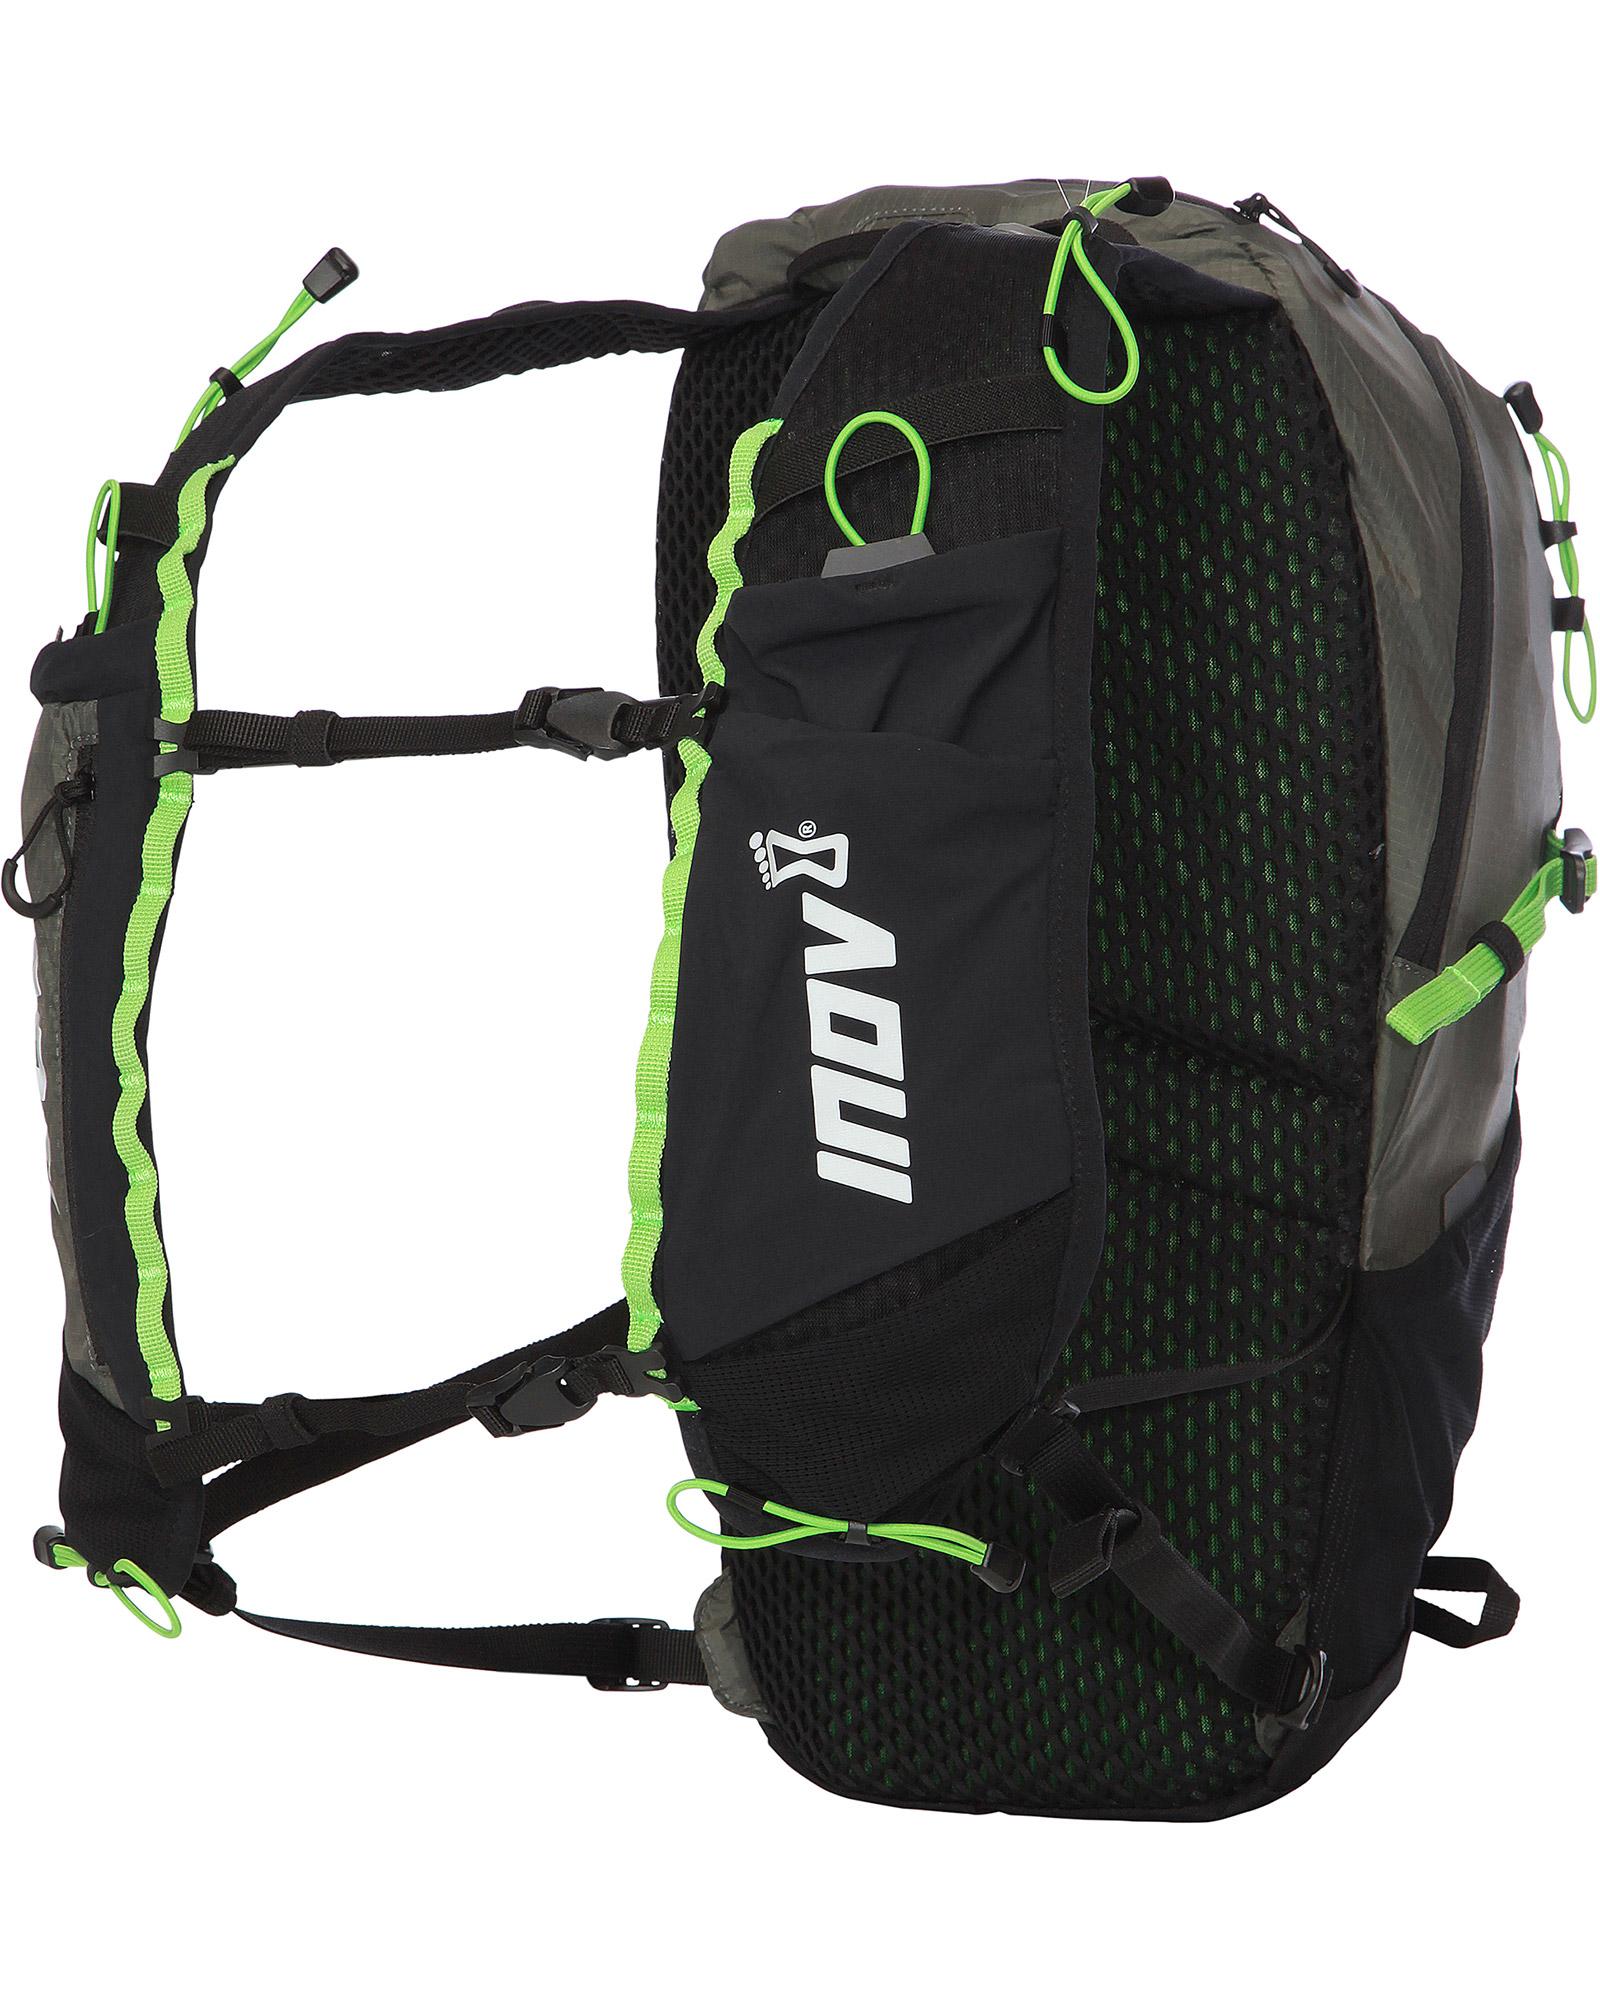 Inov-8 Adventure Lite 15 Running Vest 0